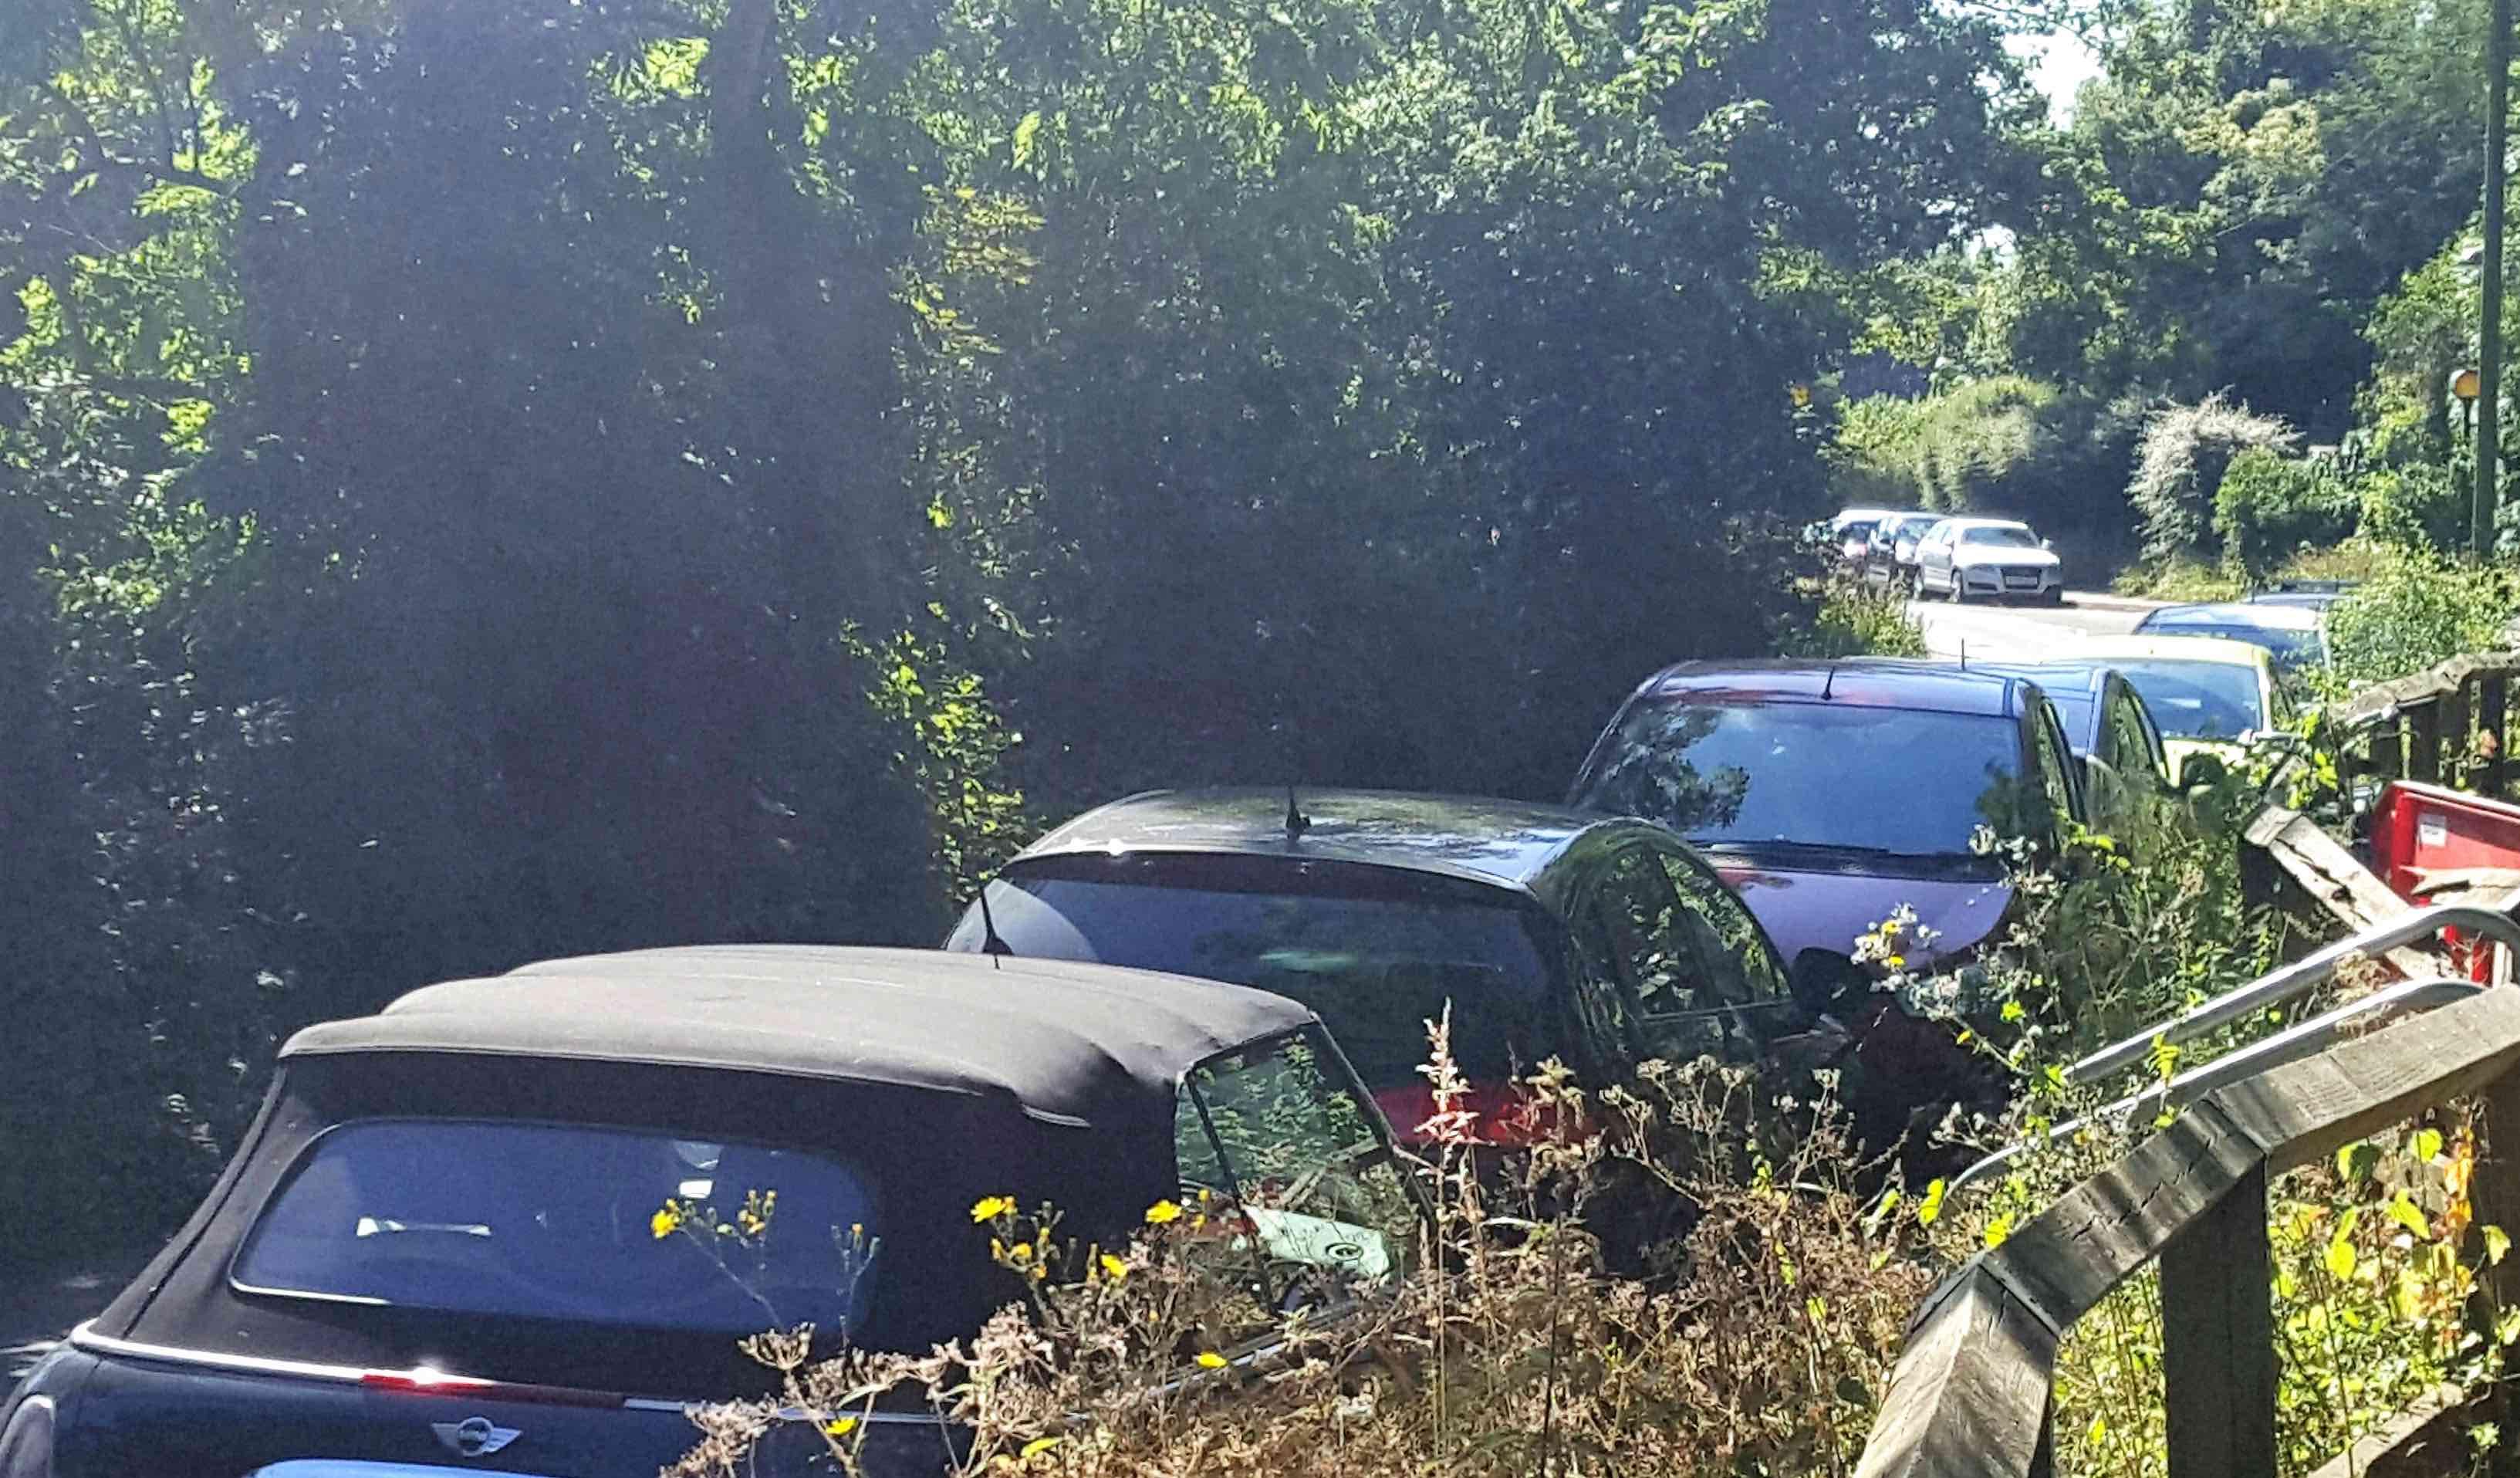 Liberal Democrat plans to tackle dangerous parking